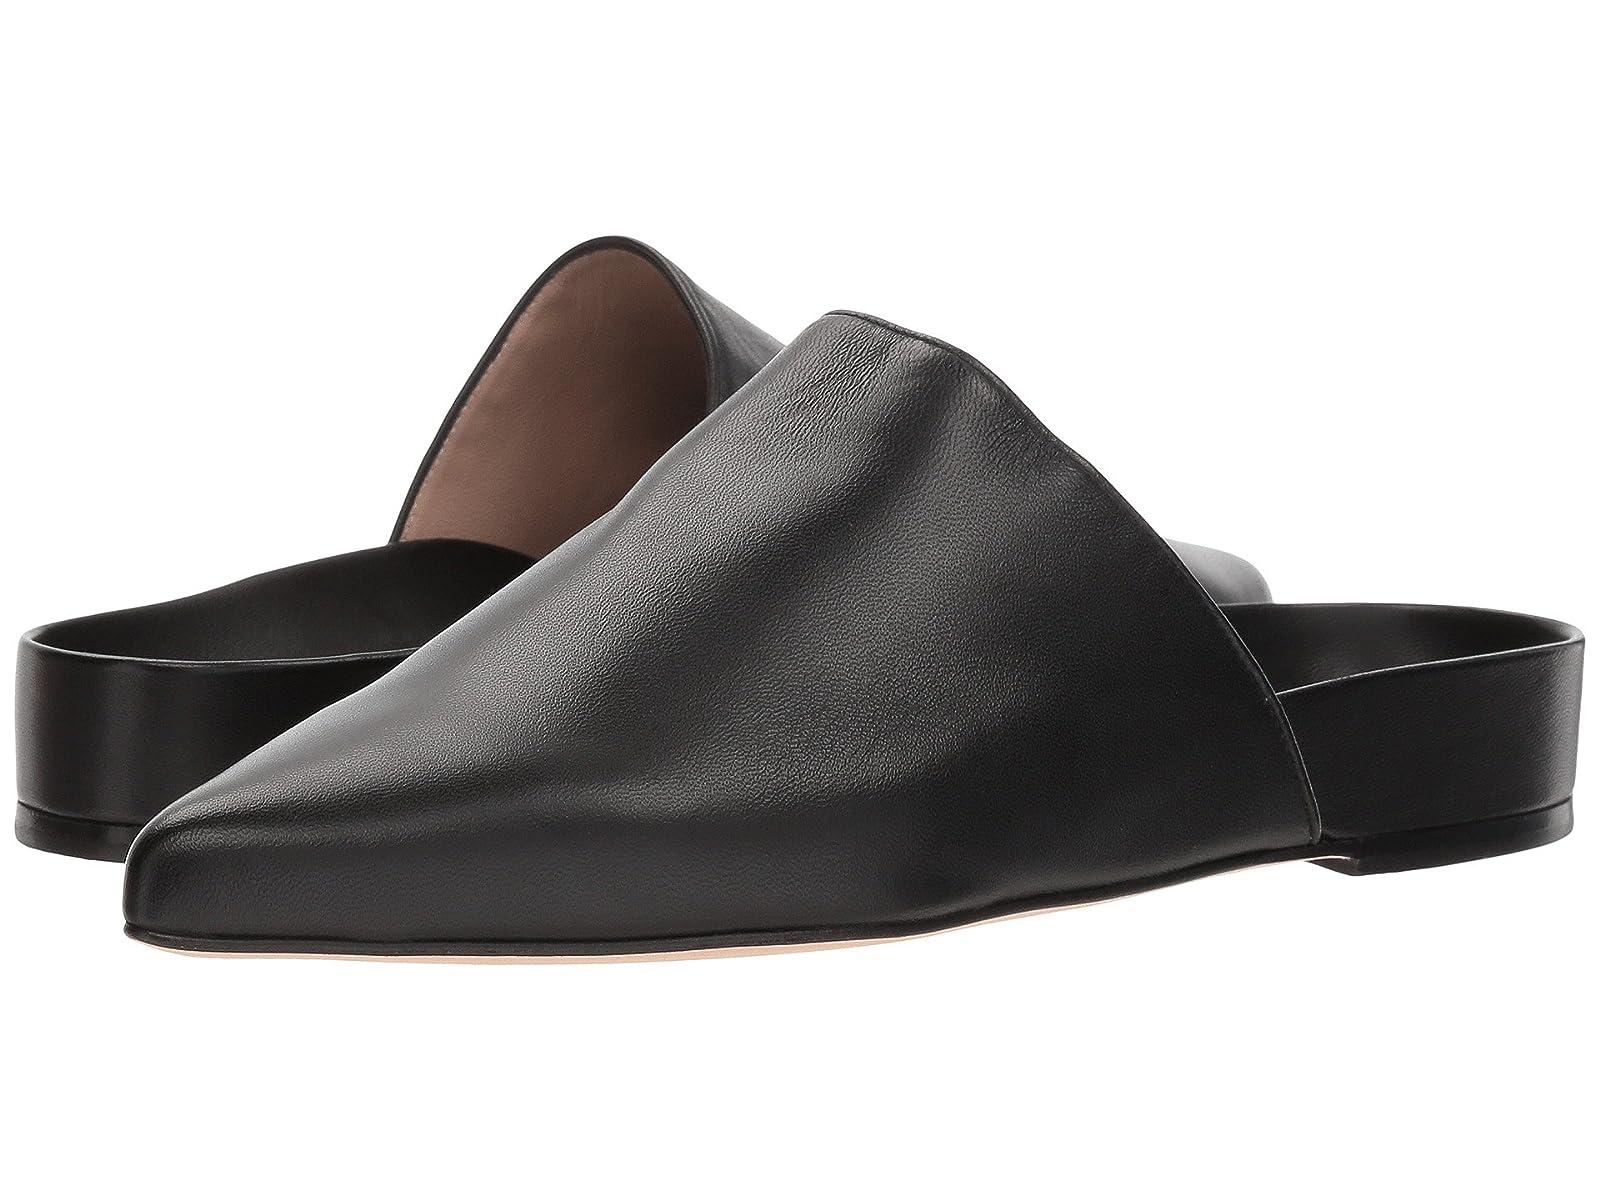 Stuart Weitzman StudioCheap and distinctive eye-catching shoes